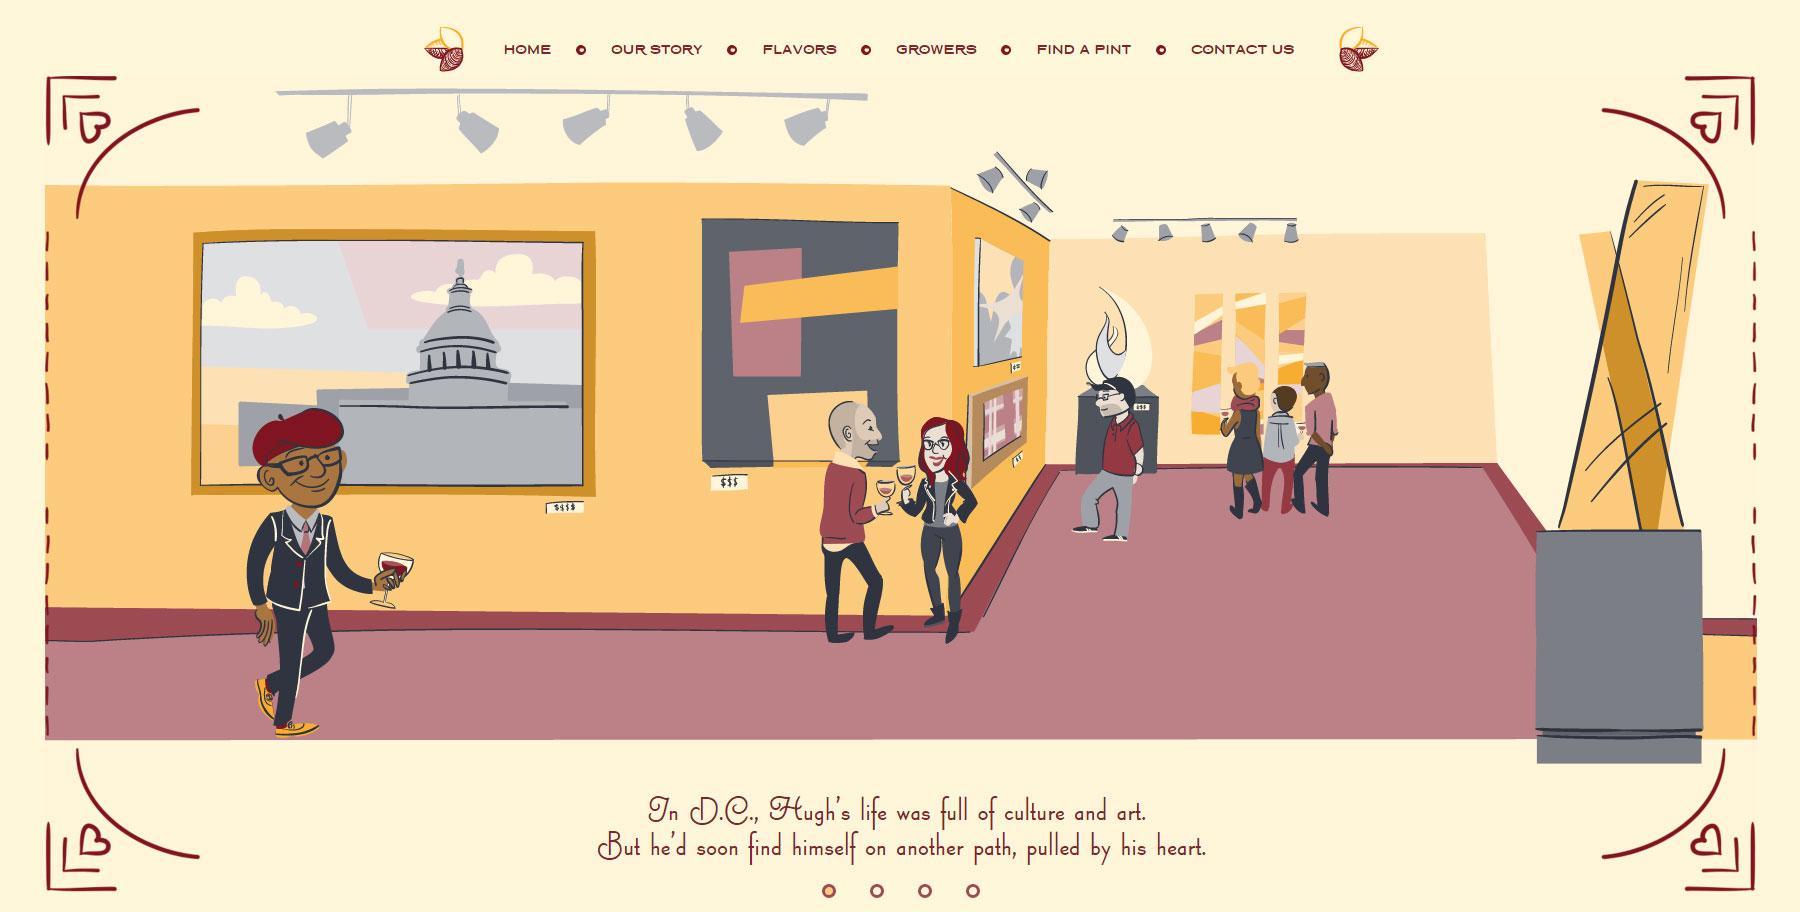 Sweet Magnolia Gelato Company - Website of the Day